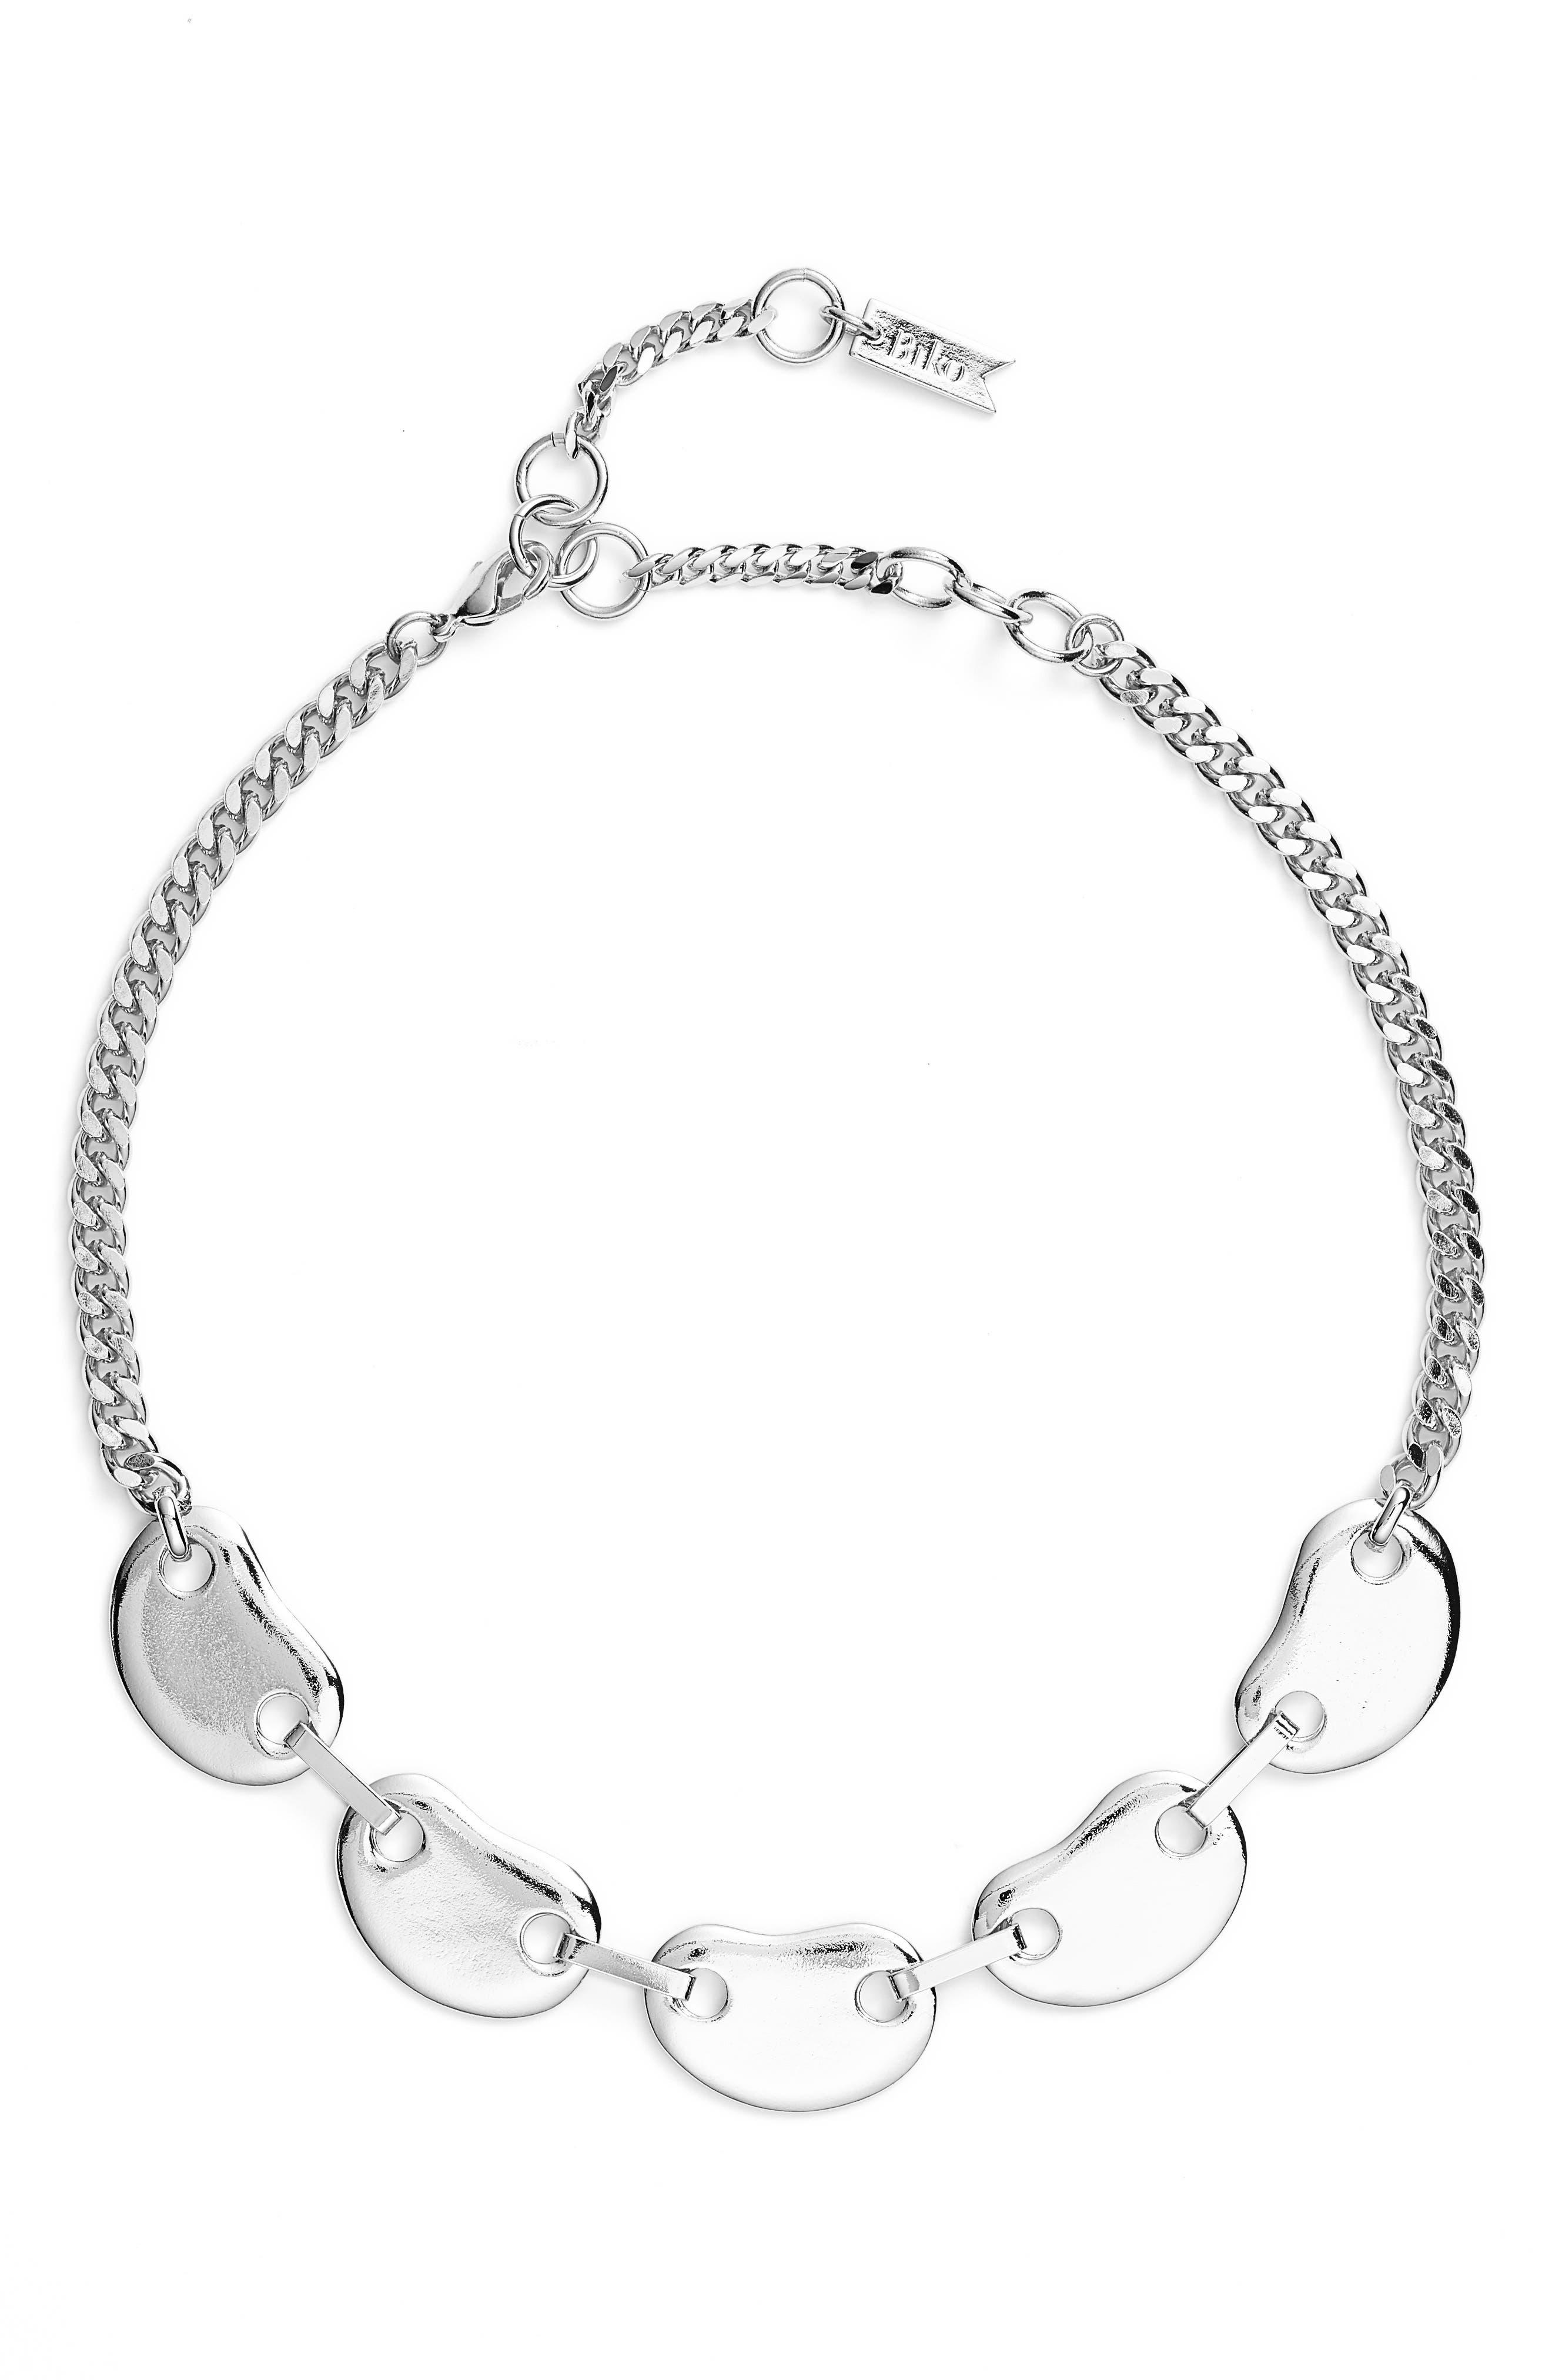 Amoeba Link Collar Necklace,                             Main thumbnail 1, color,                             Silver